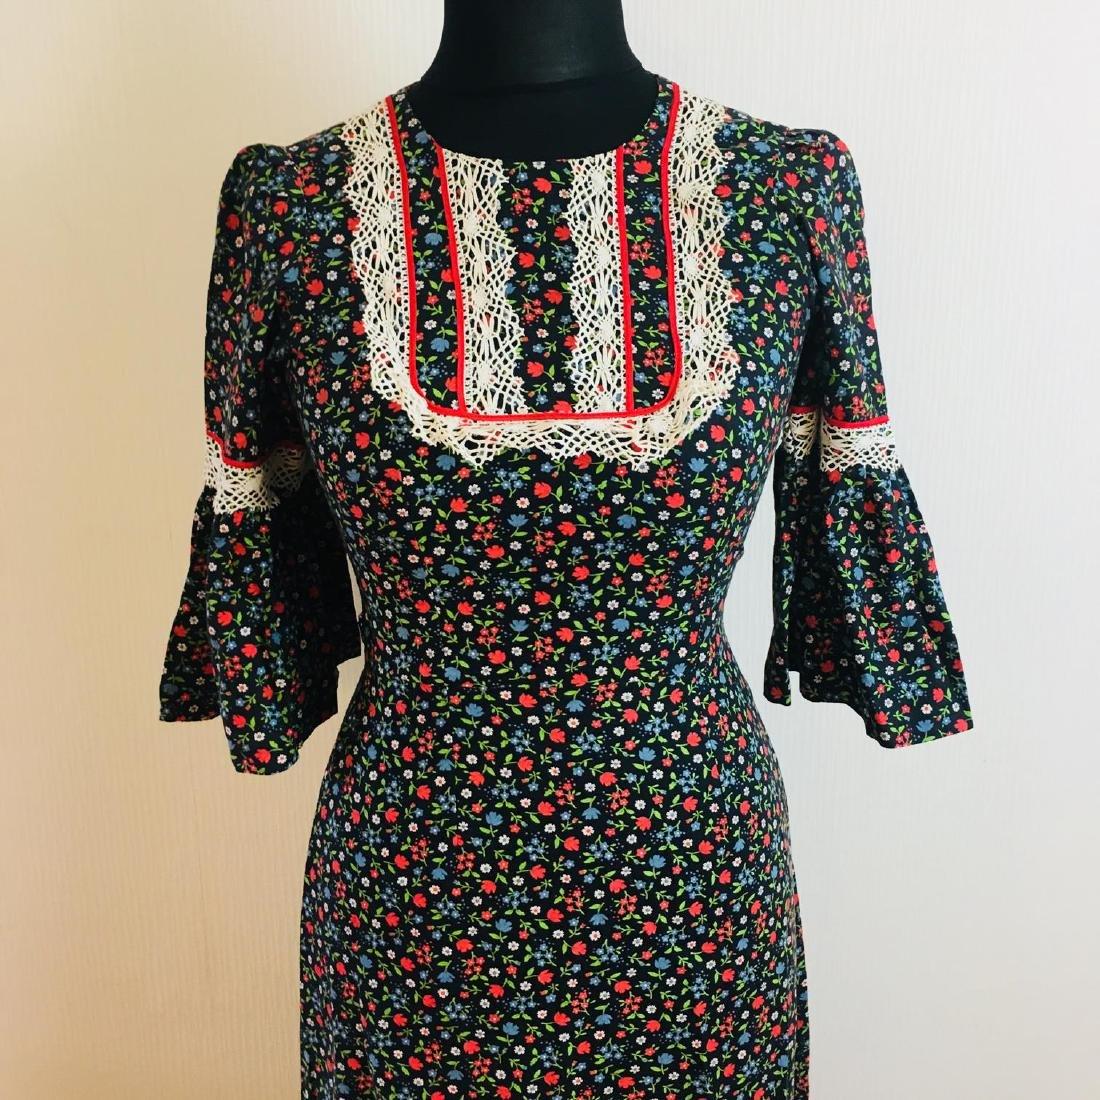 Vintage Women's Tyrolean Style Dress Size EUR 36 US 6 - 3